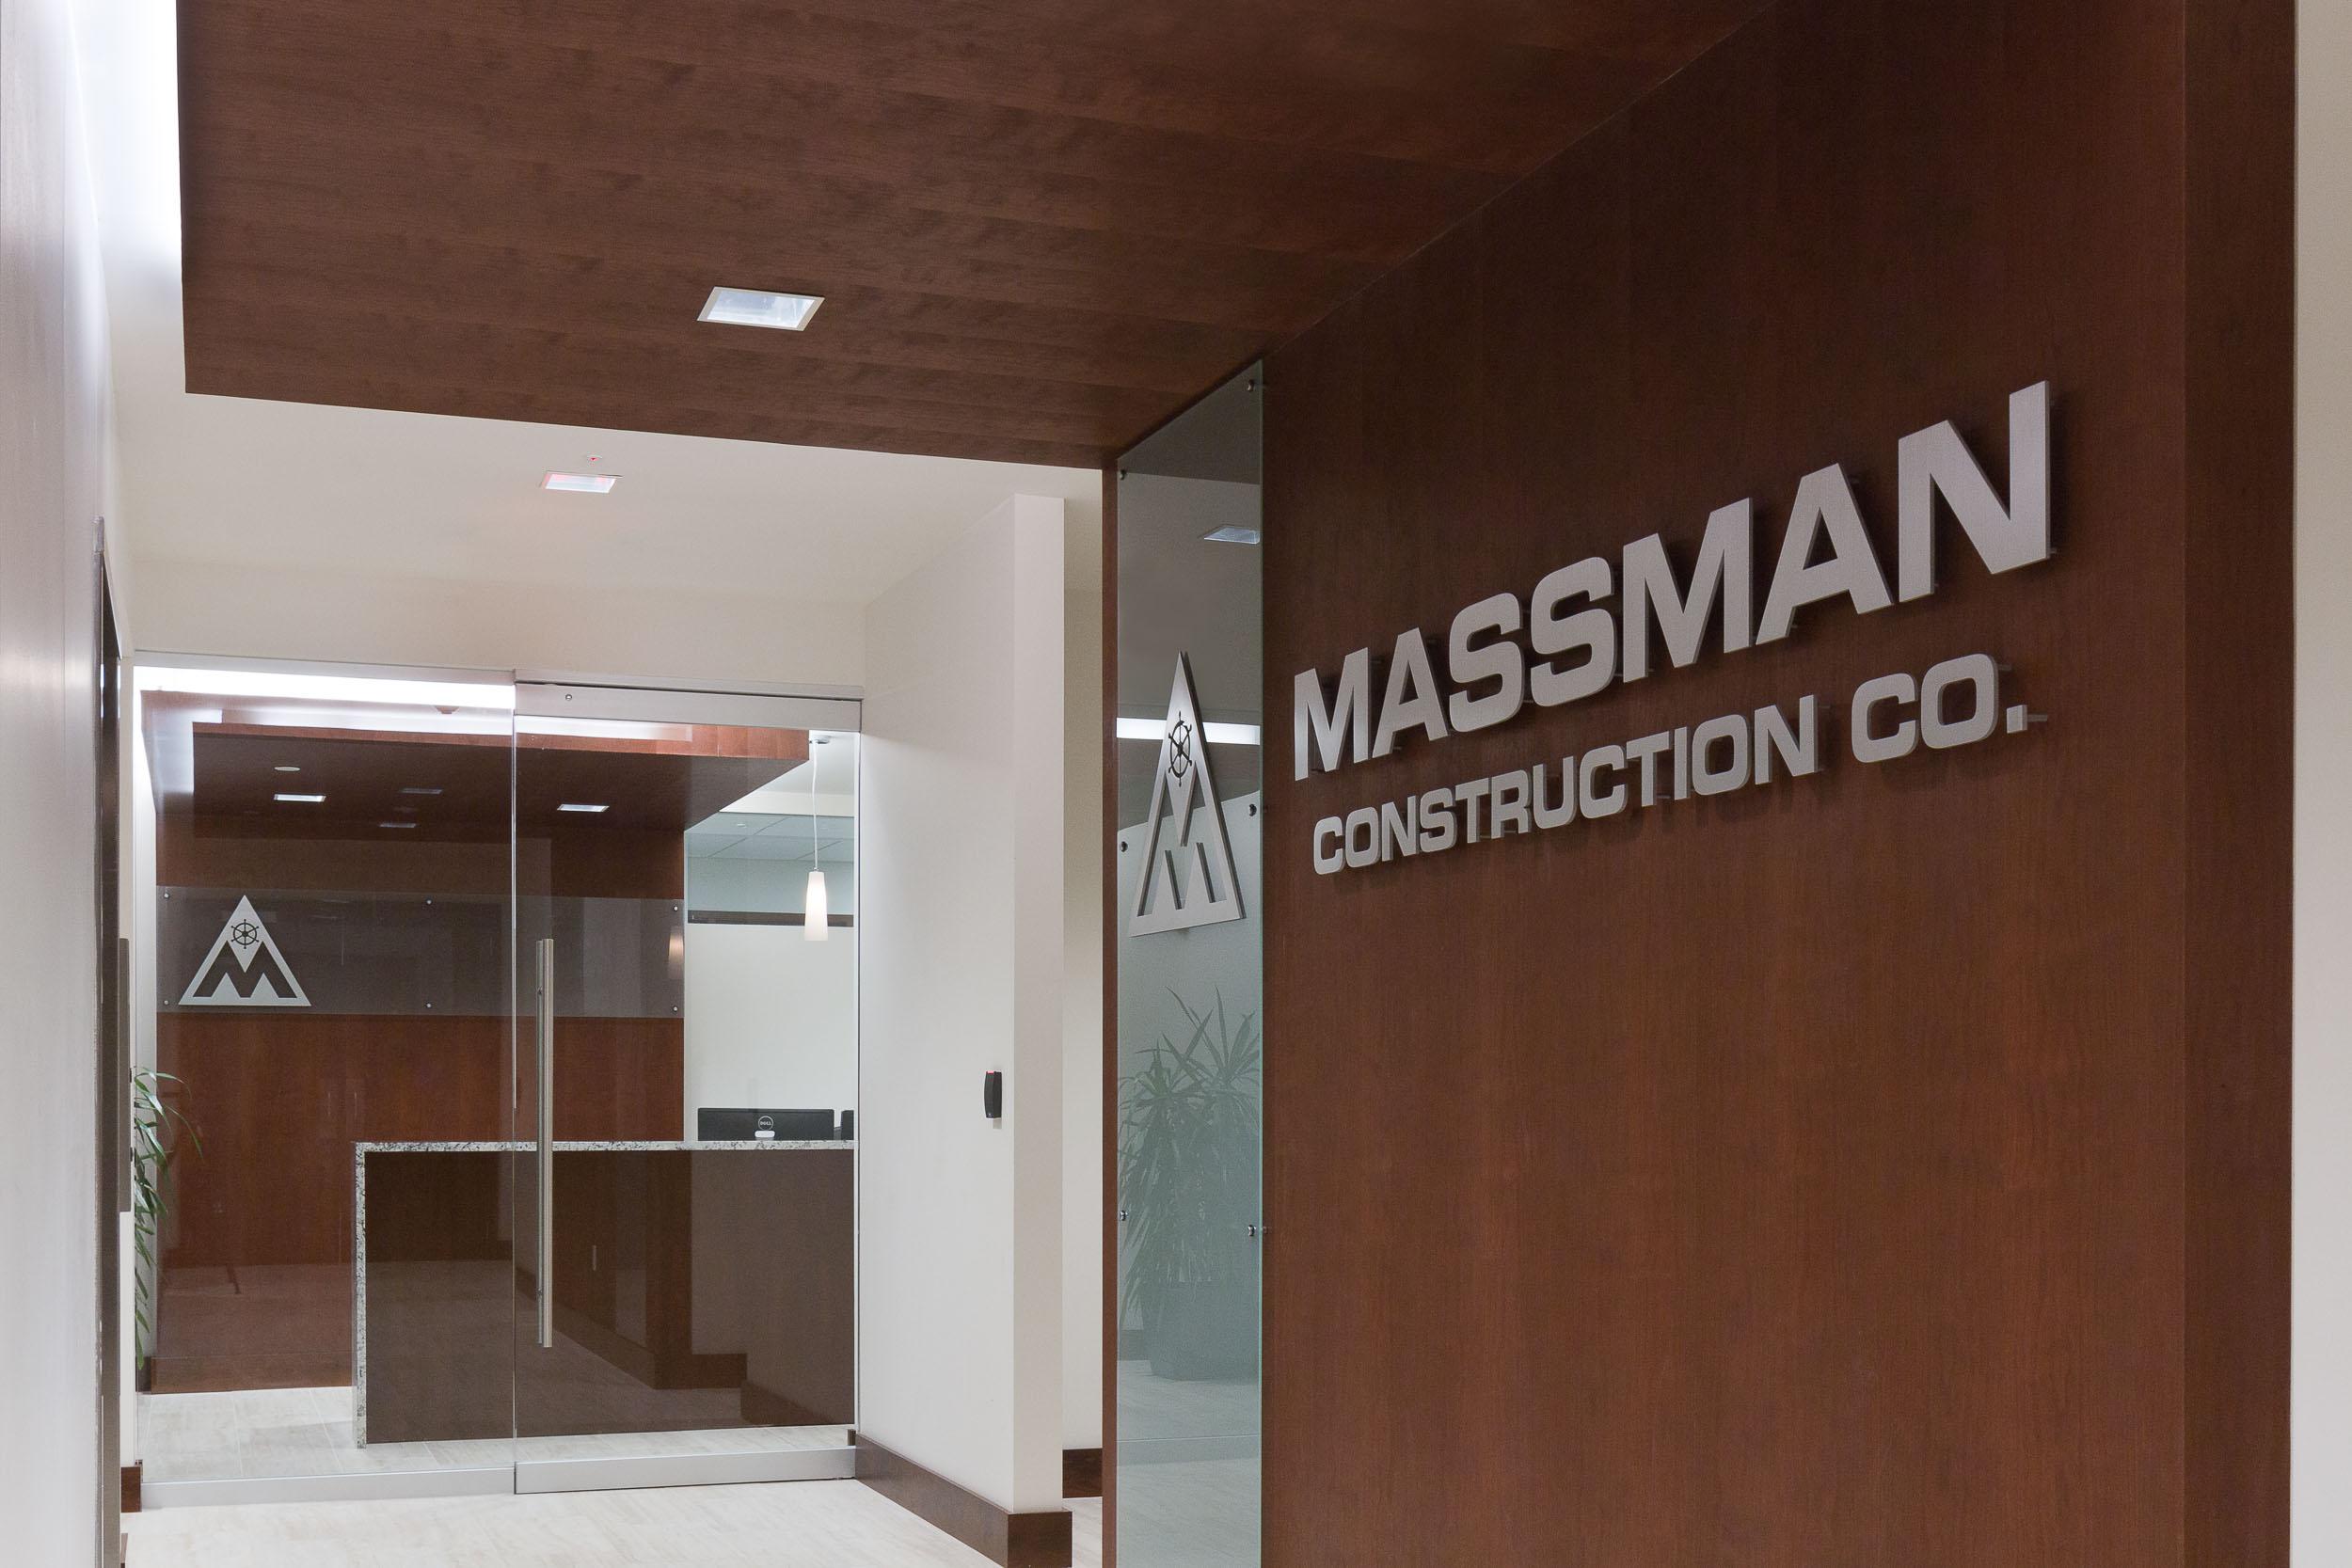 Massman Construction